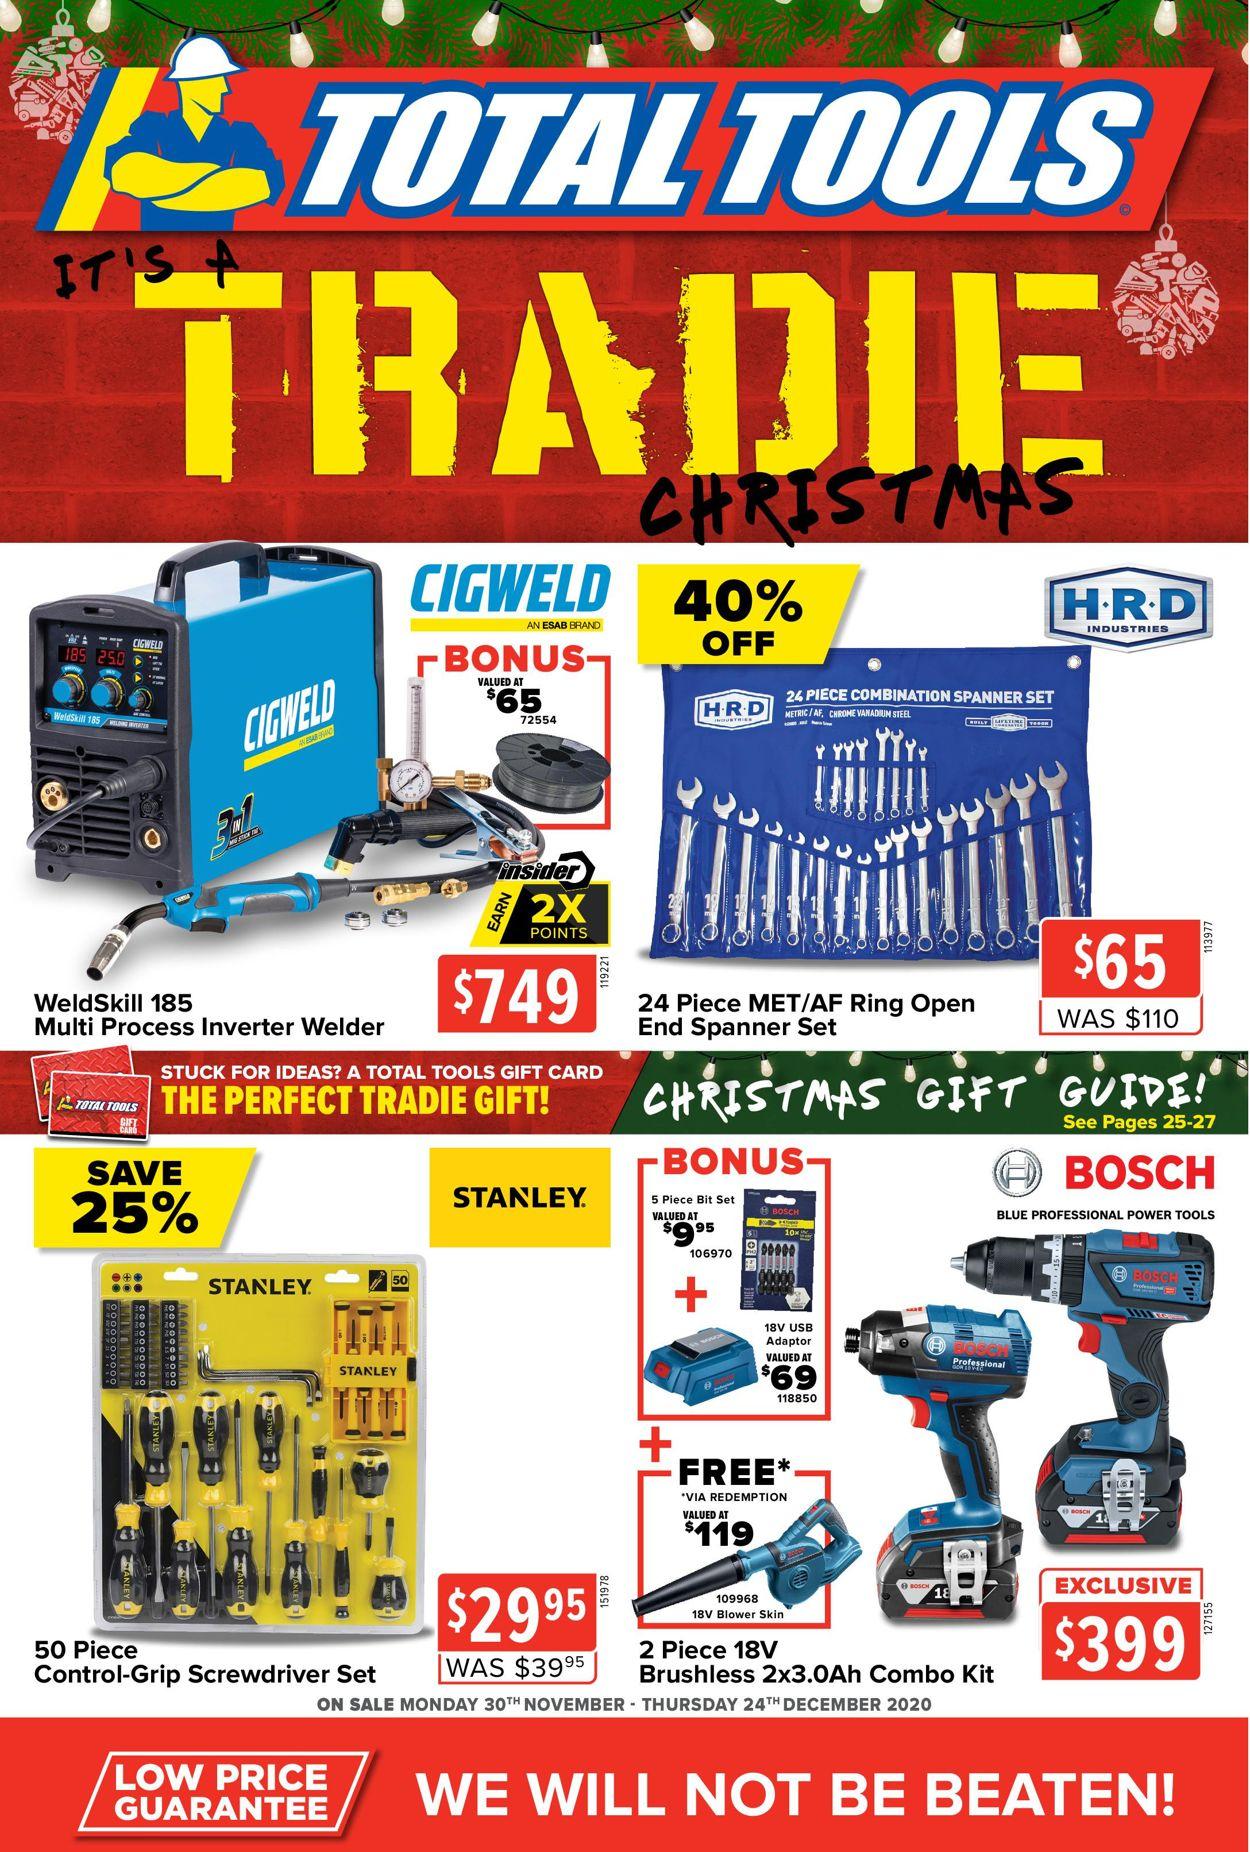 Total Tools - Christmas 2020 Catalogue - 30/11-24/12/2020